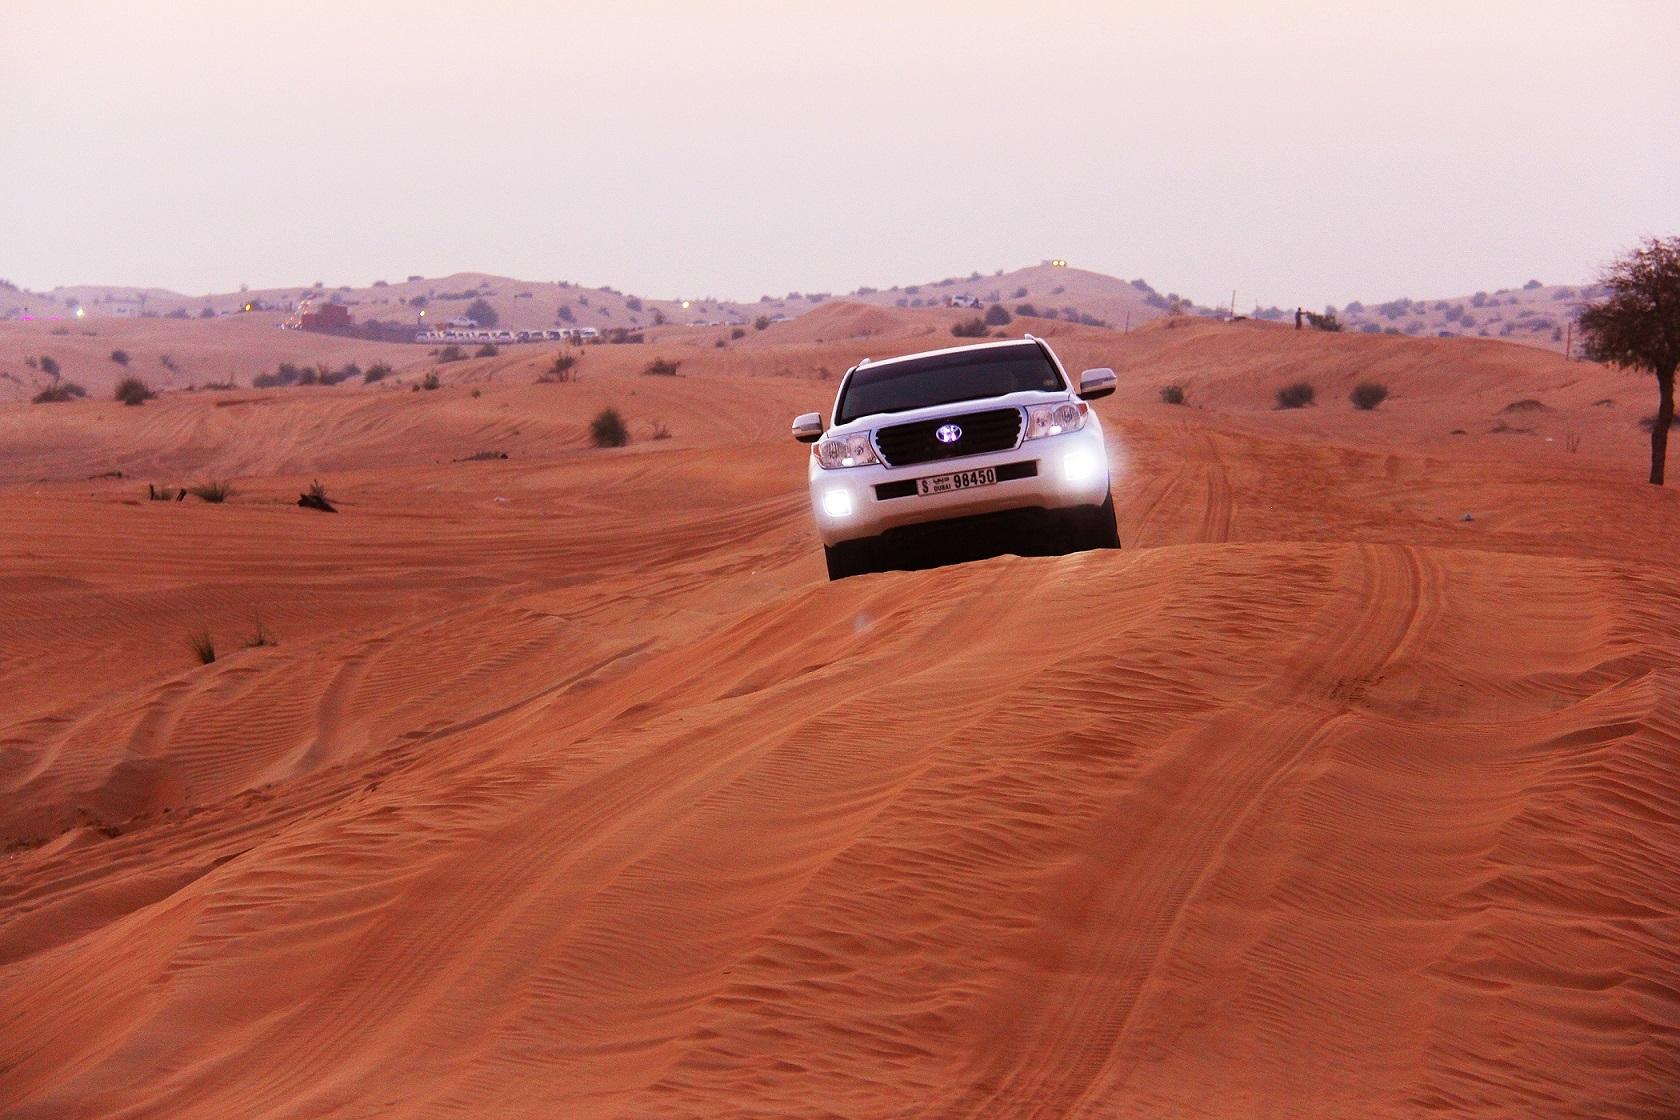 Dubai Desert 4WD